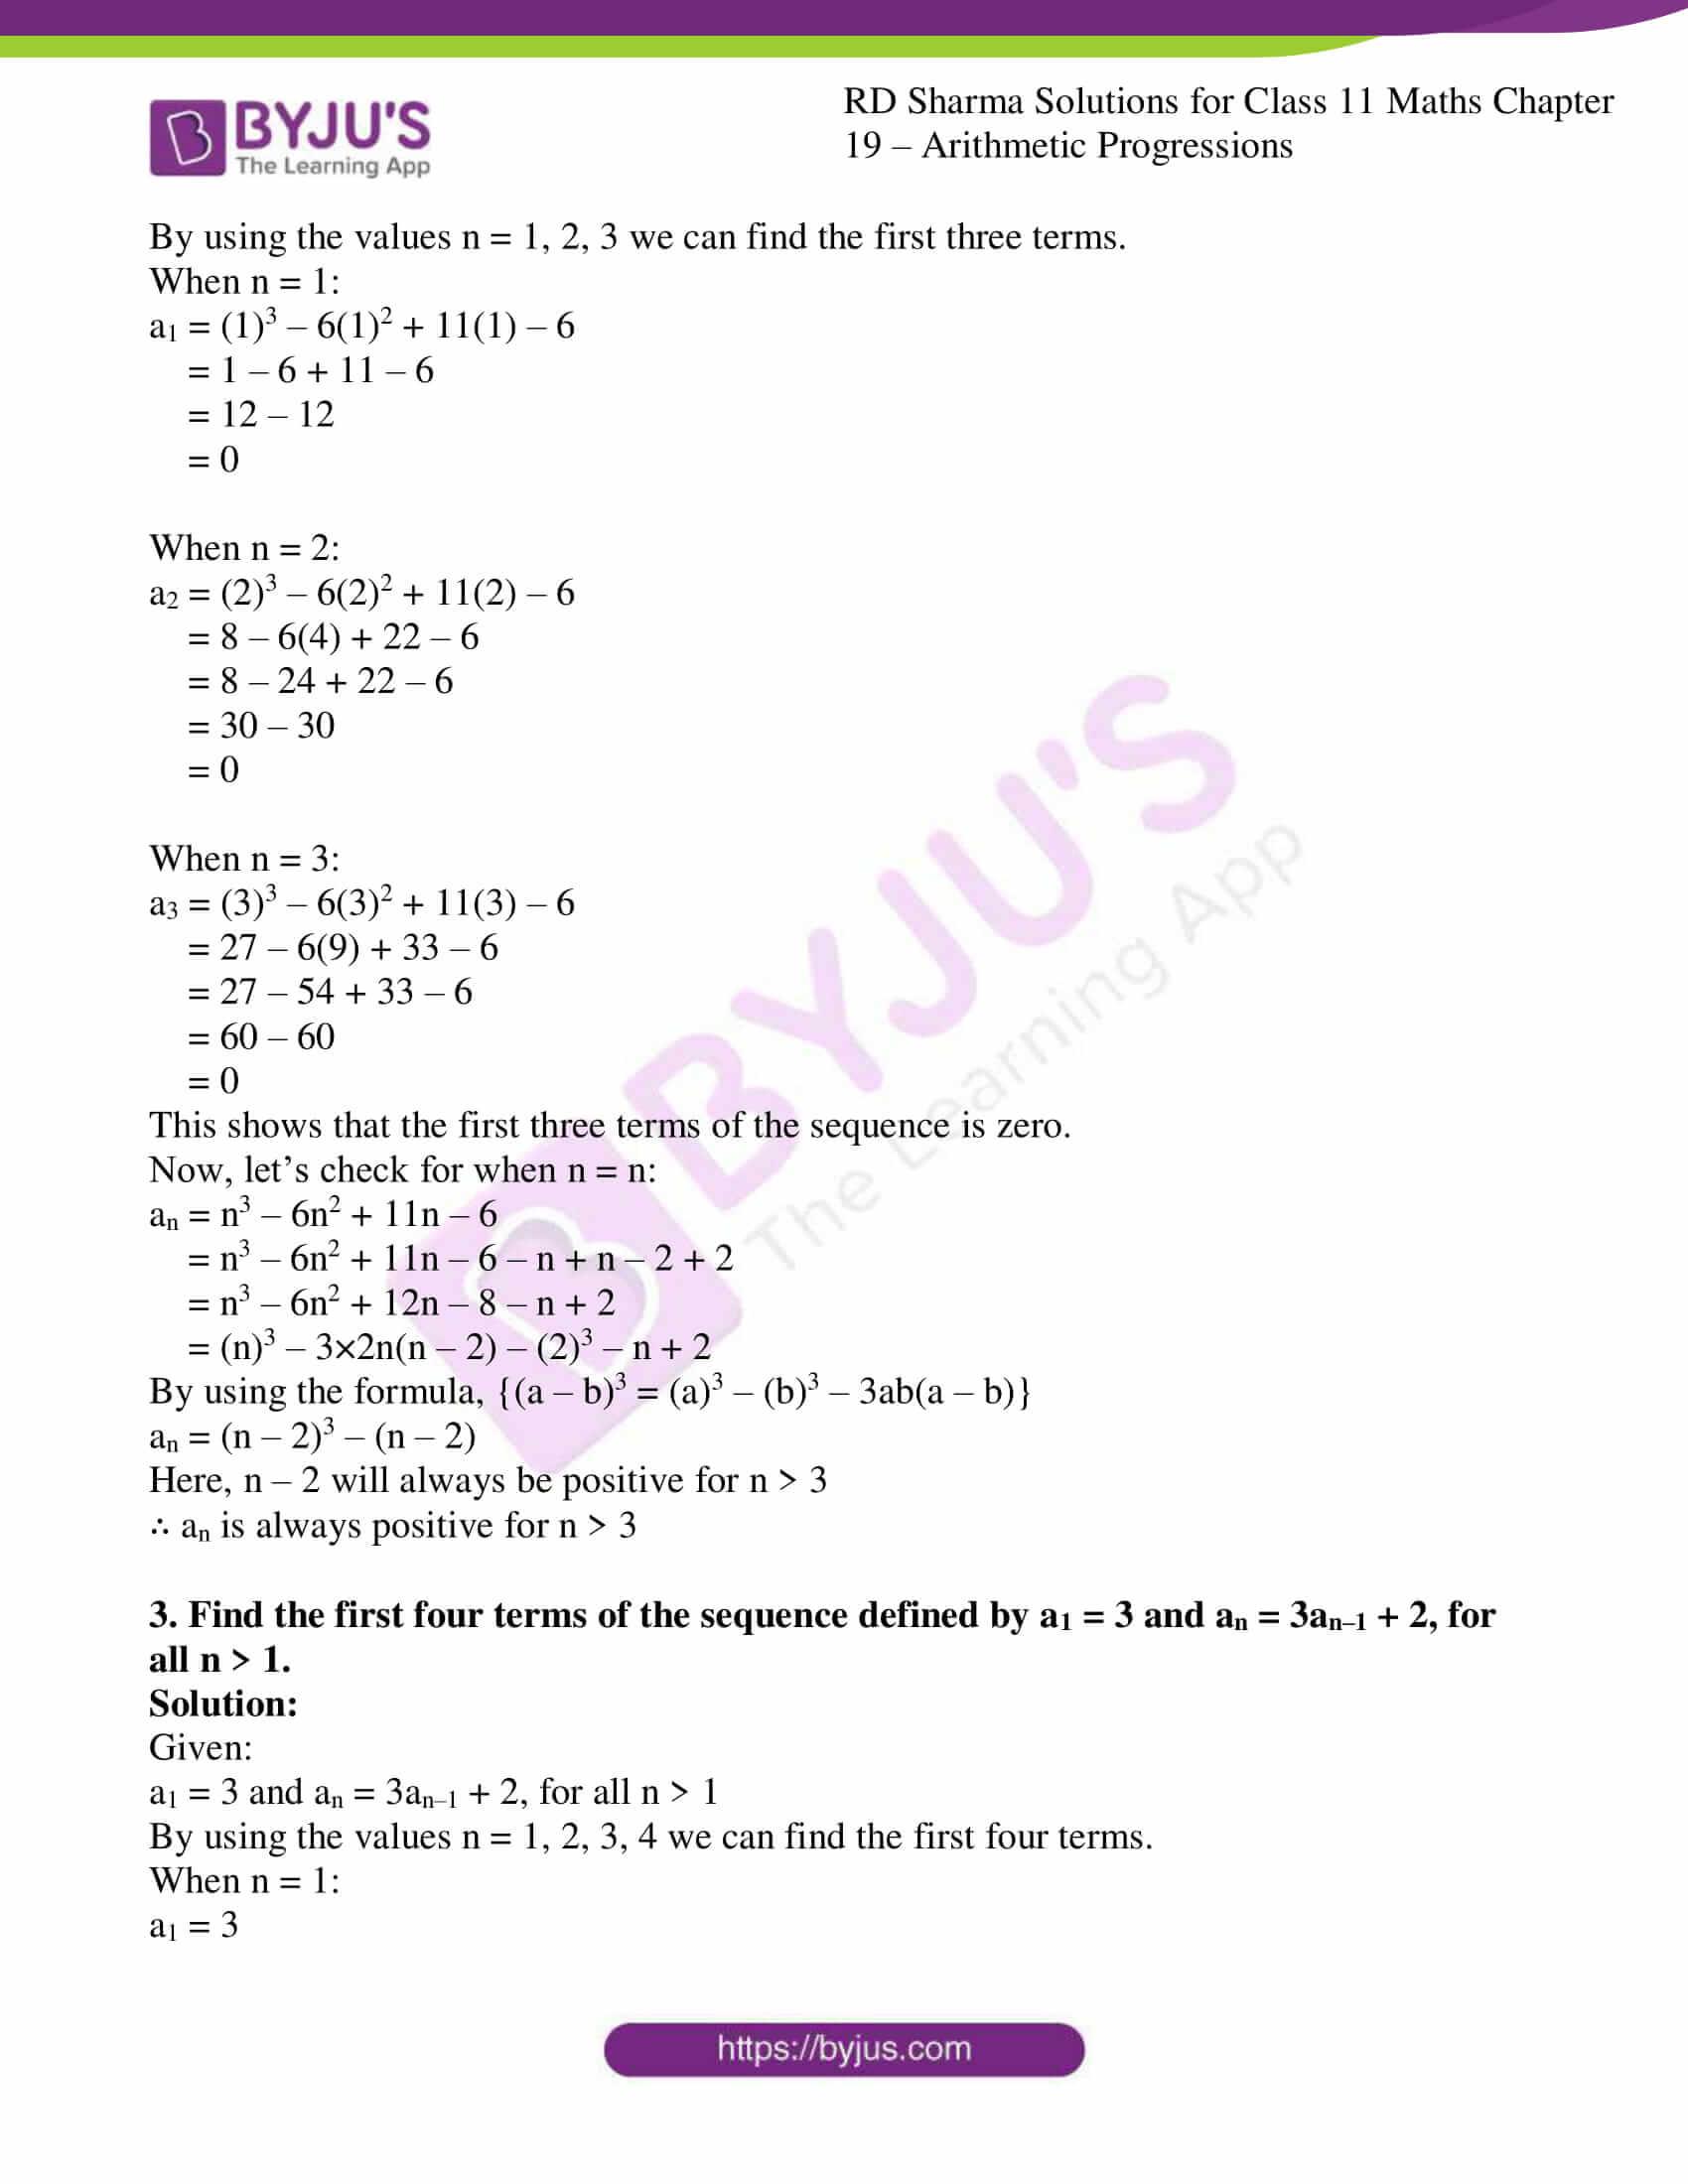 rd sharma class 11 maths ch 19 ex 1 2